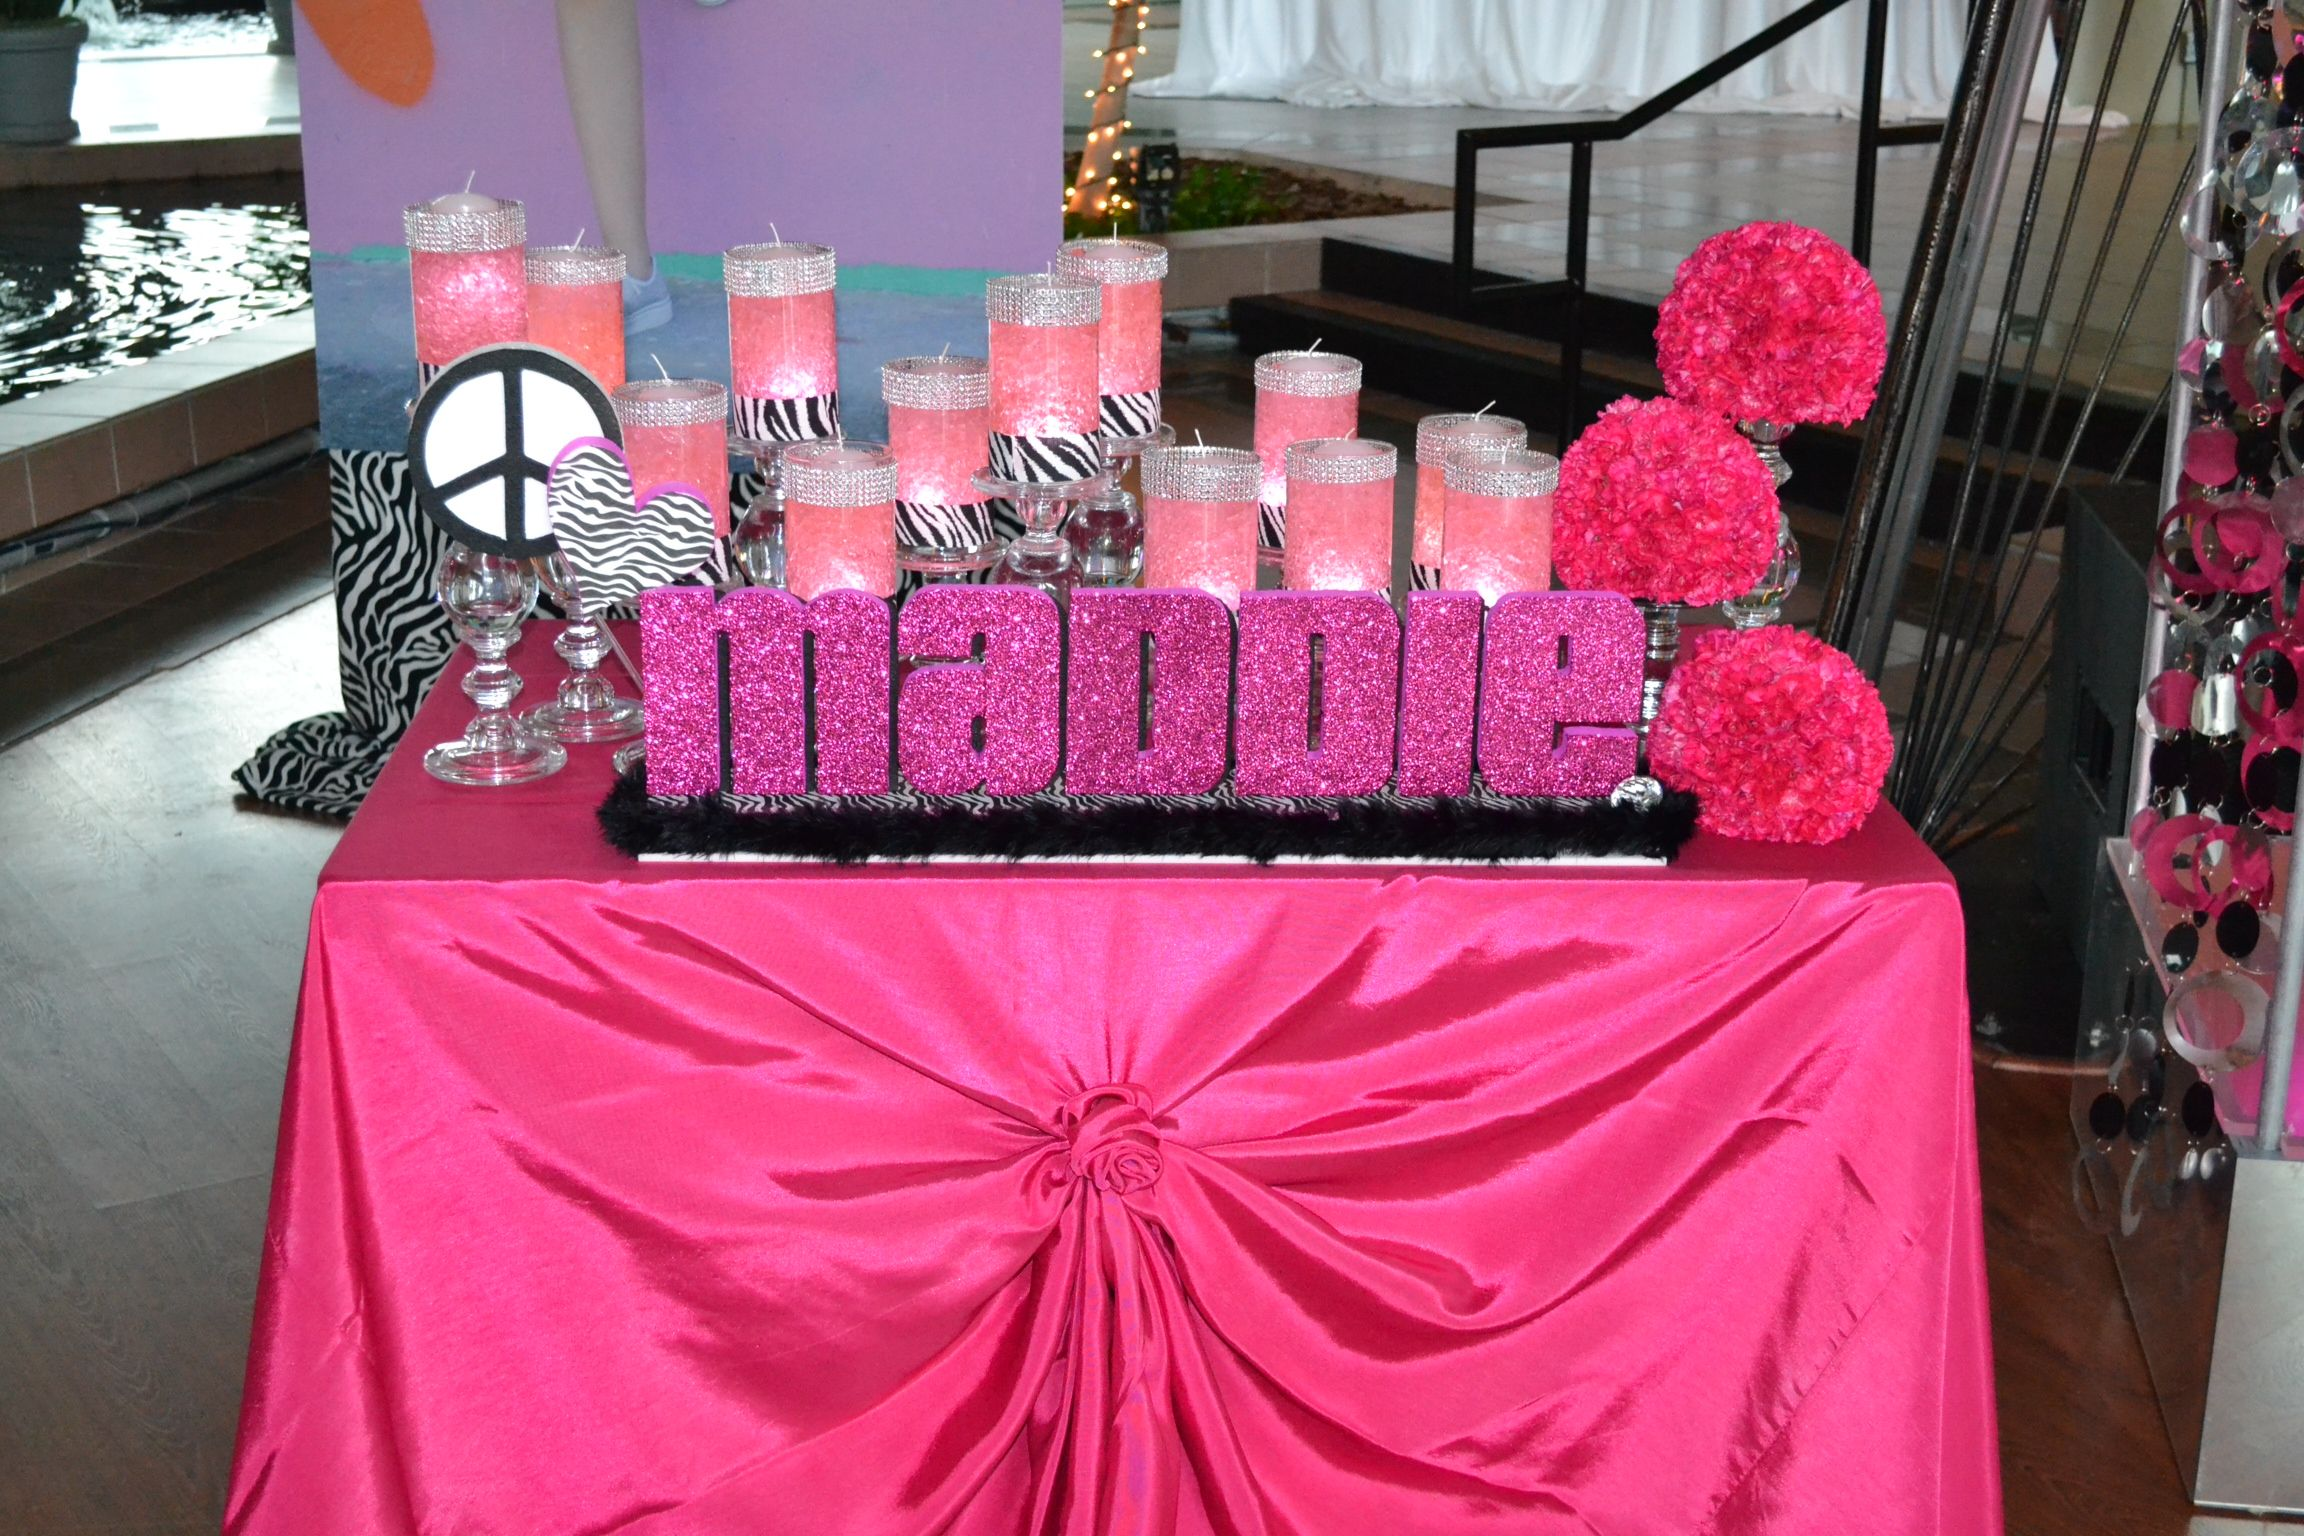 Bat Mitzvah Candle lighting Display Party Perfect Boca Raton FL 1(561) & Bat Mitzvah Candle lighting Display Party Perfect Boca Raton FL ... azcodes.com